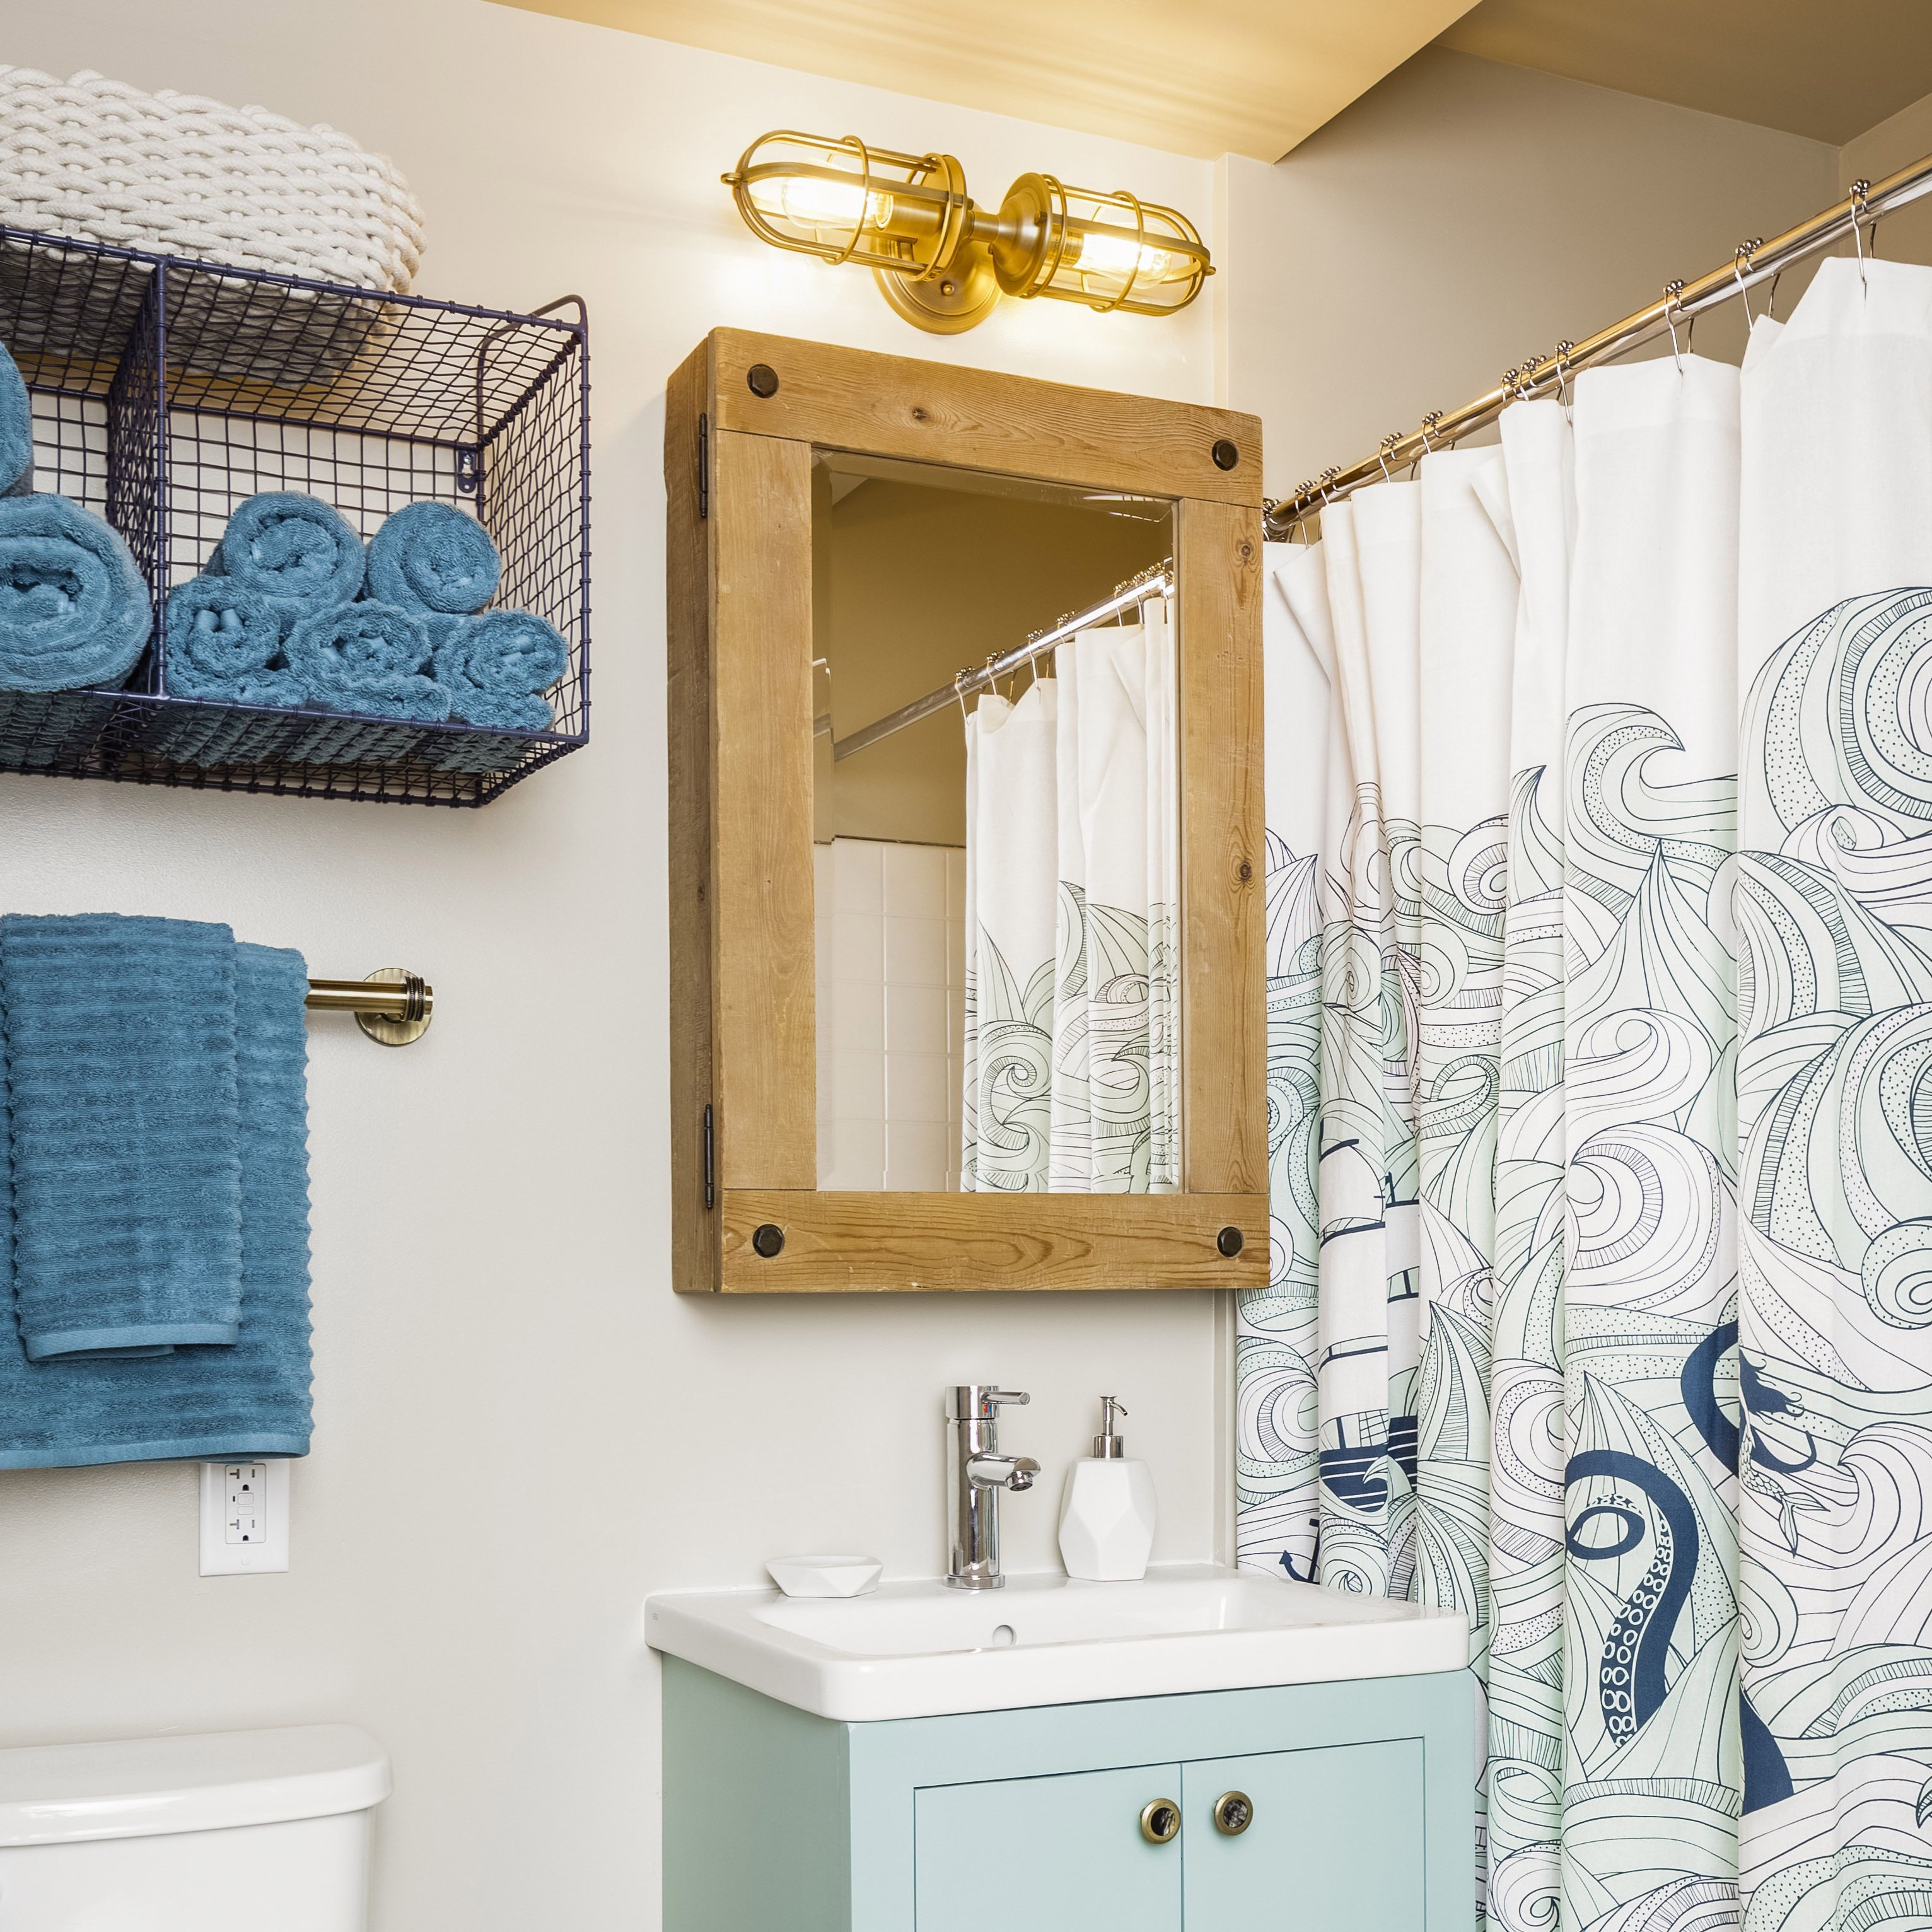 Nautical Bathroom Ideas, Nautical Pictures For Bathrooms